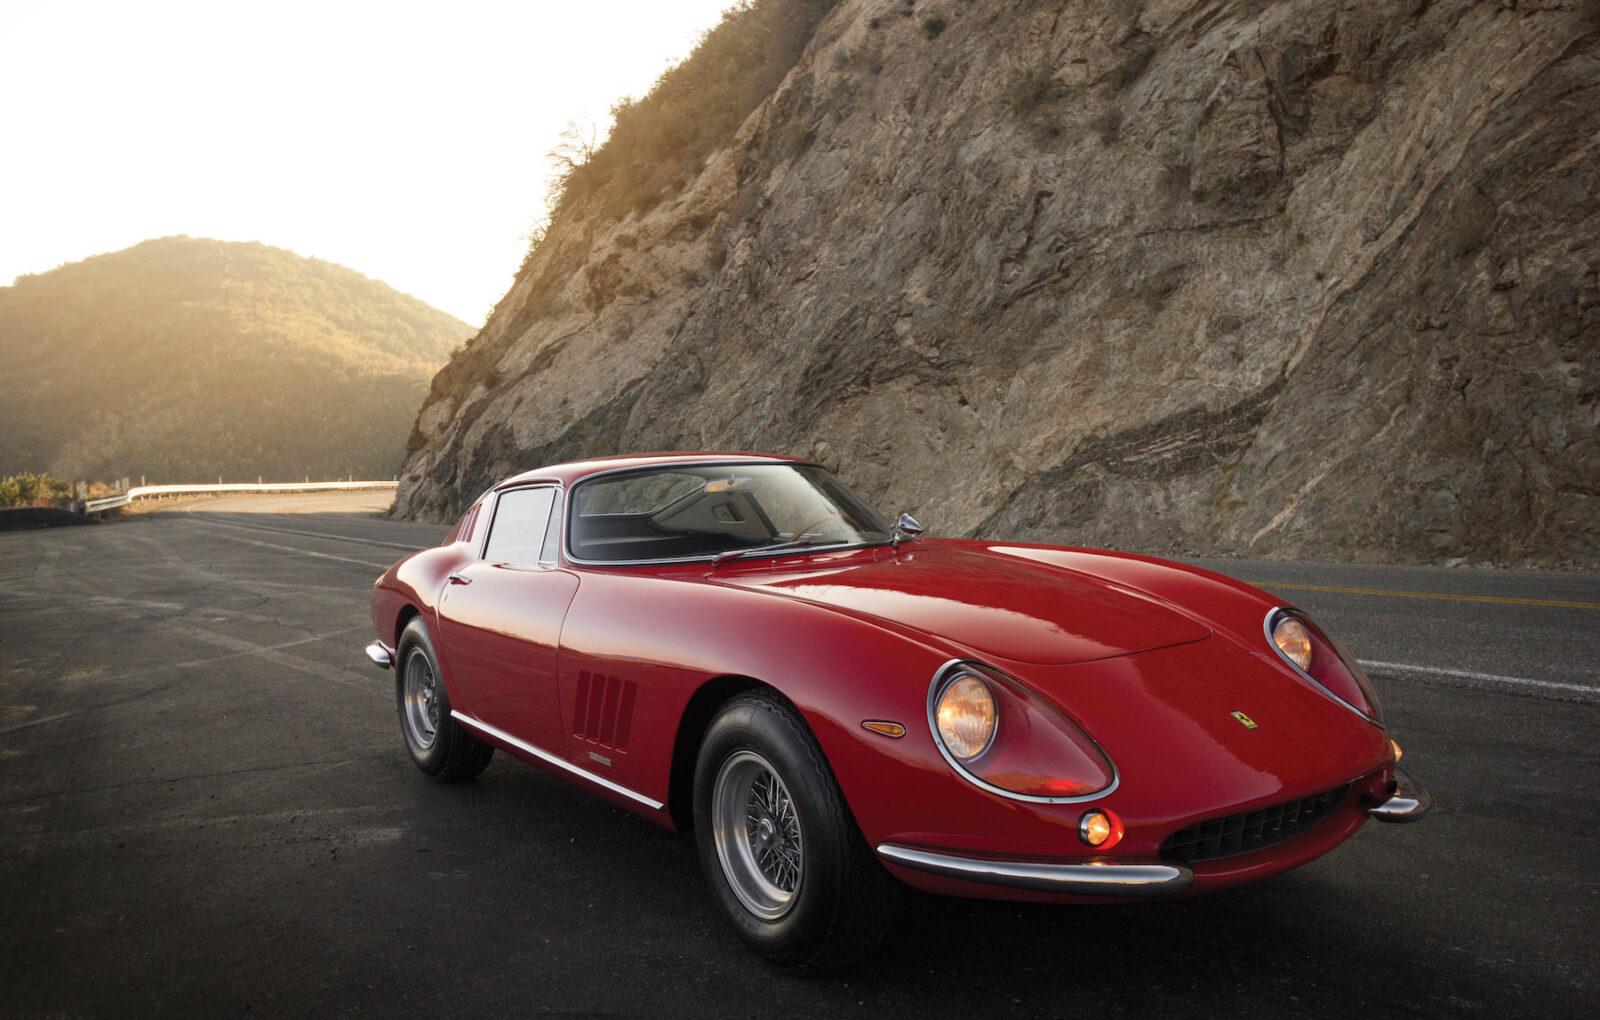 Ferrari 275 GTB 1 1600x1020 - Ferrari 275 GTB